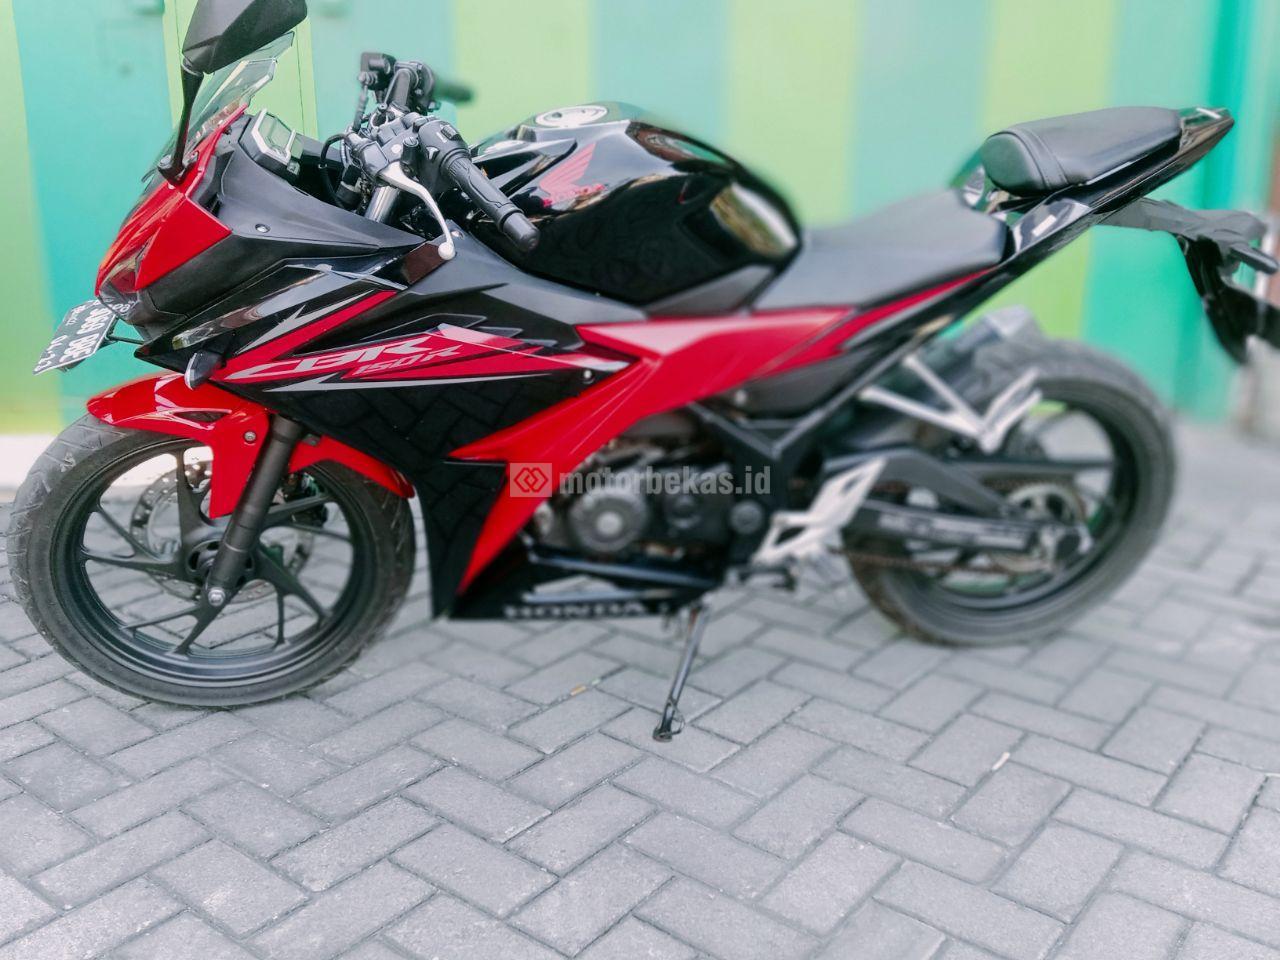 HONDA CBR 150R FI 3185 motorbekas.id